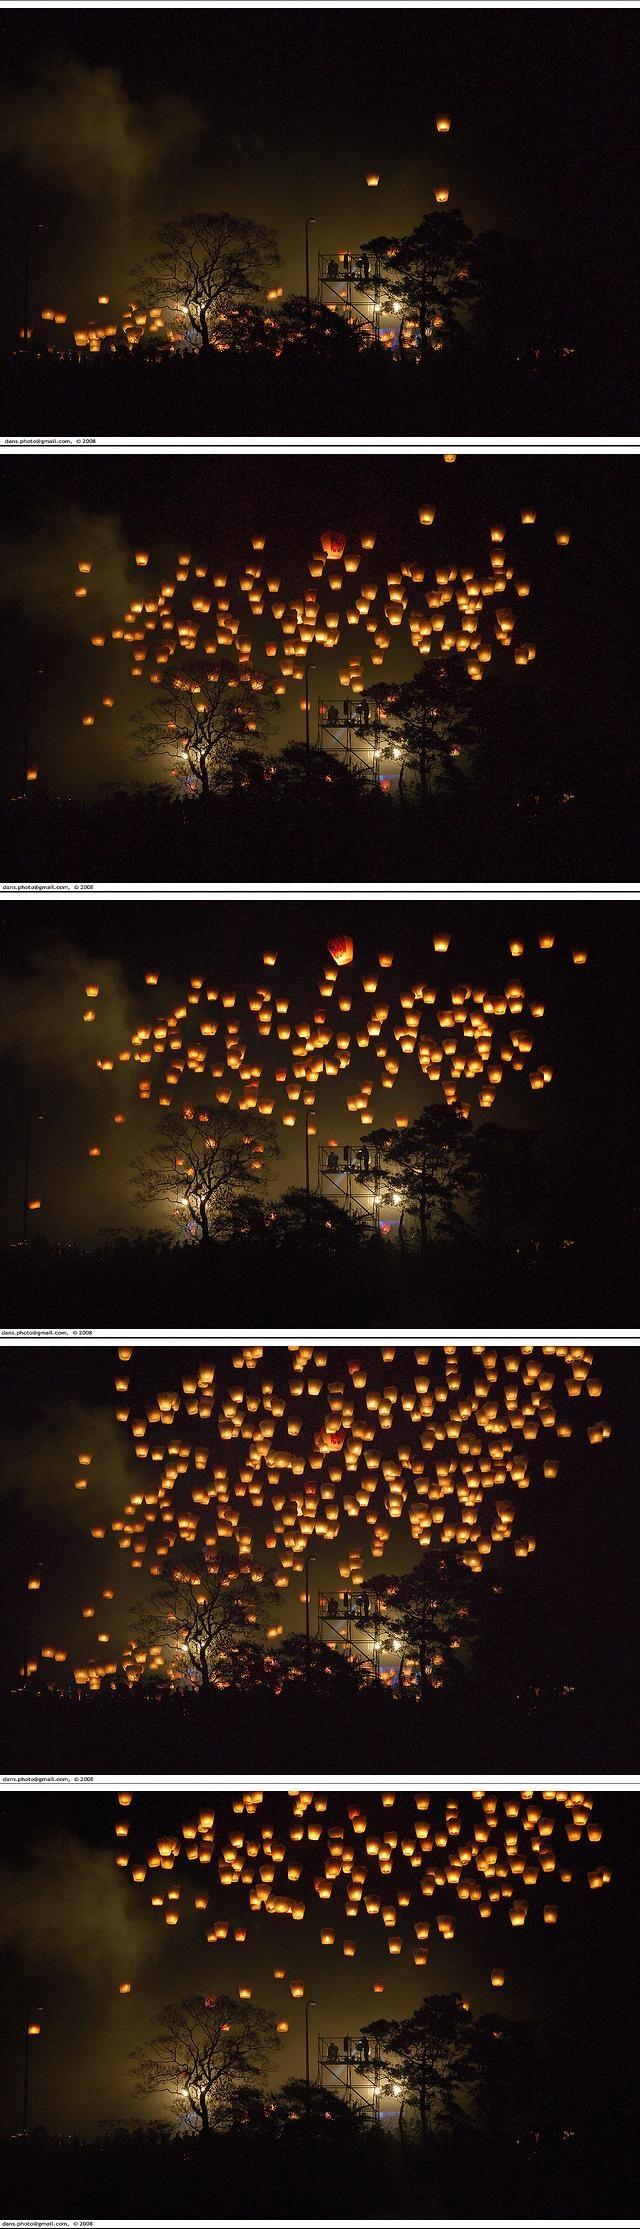 lantern festival: Lanterns Festivals, Lantern Festival